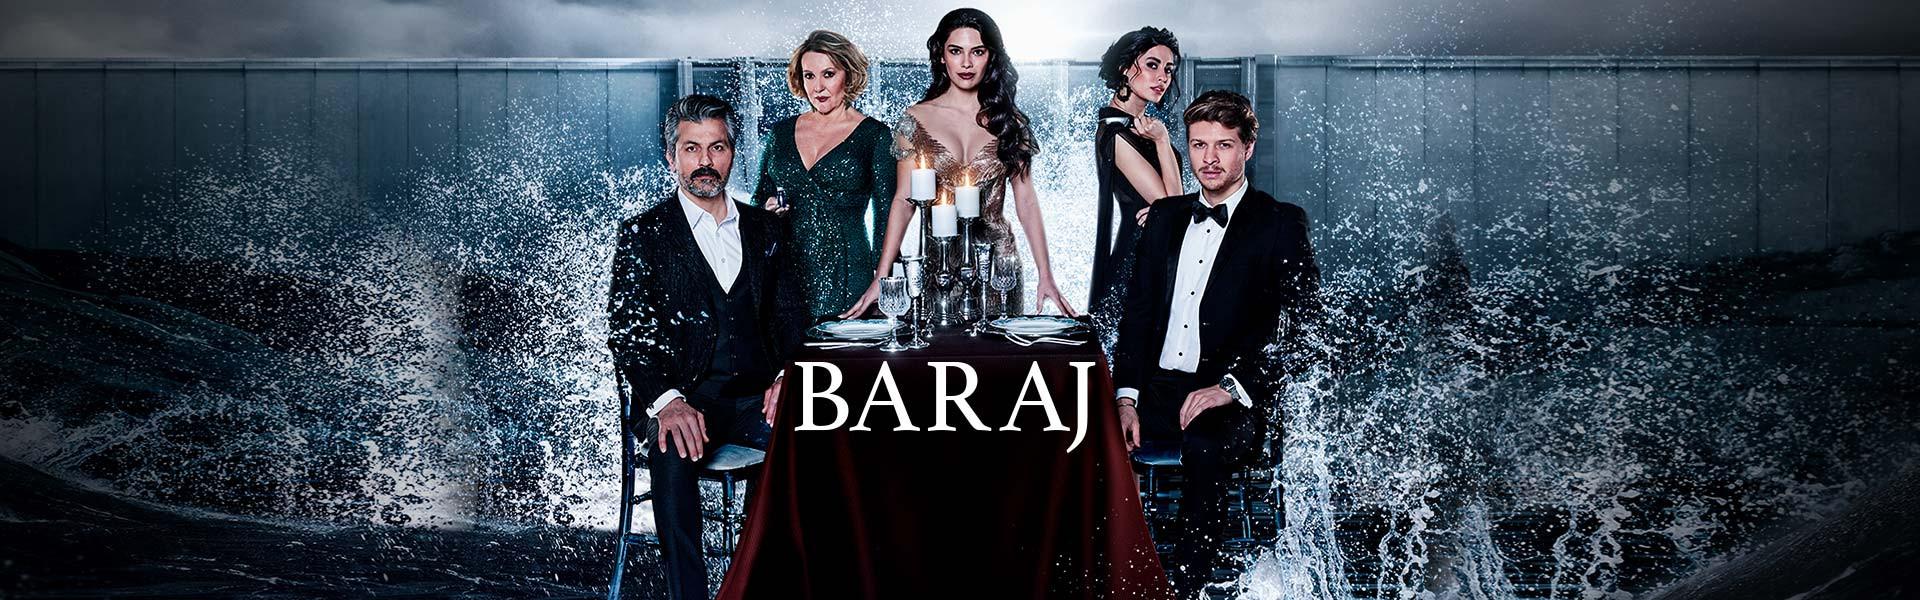 4 of Baraj